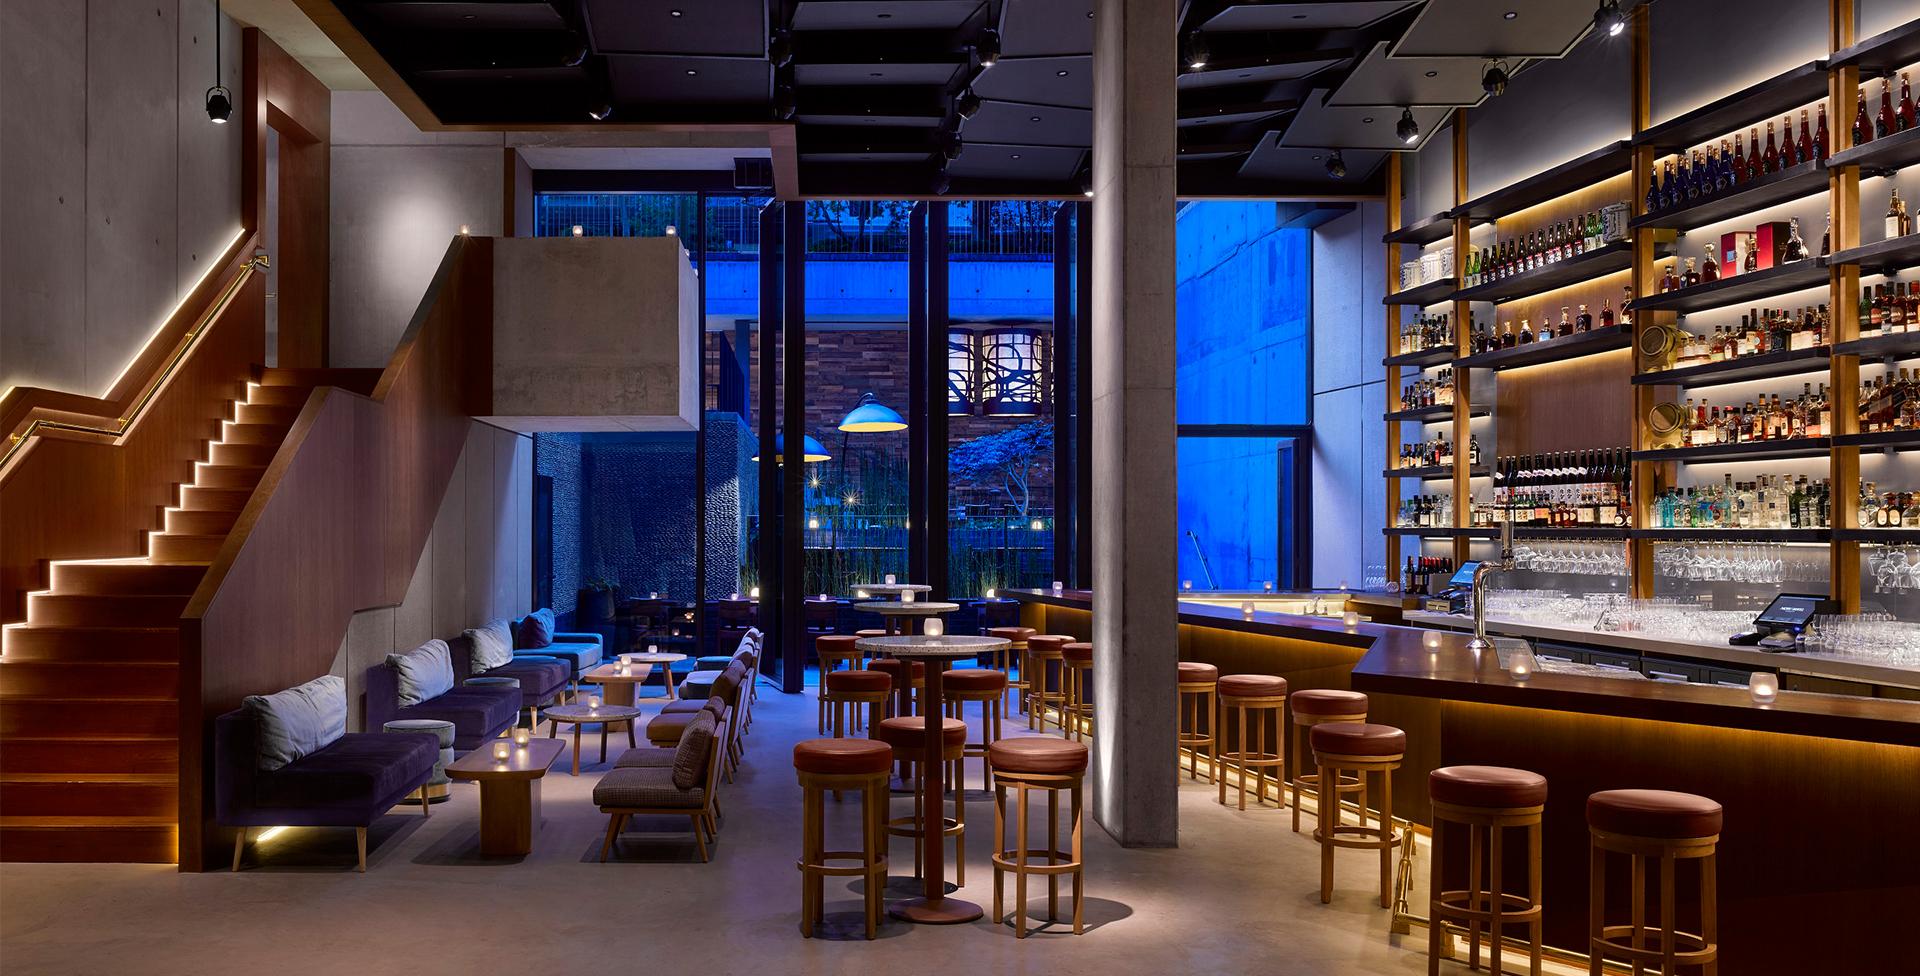 Nobu Hotel Shoreditch - Men's Style Council Place